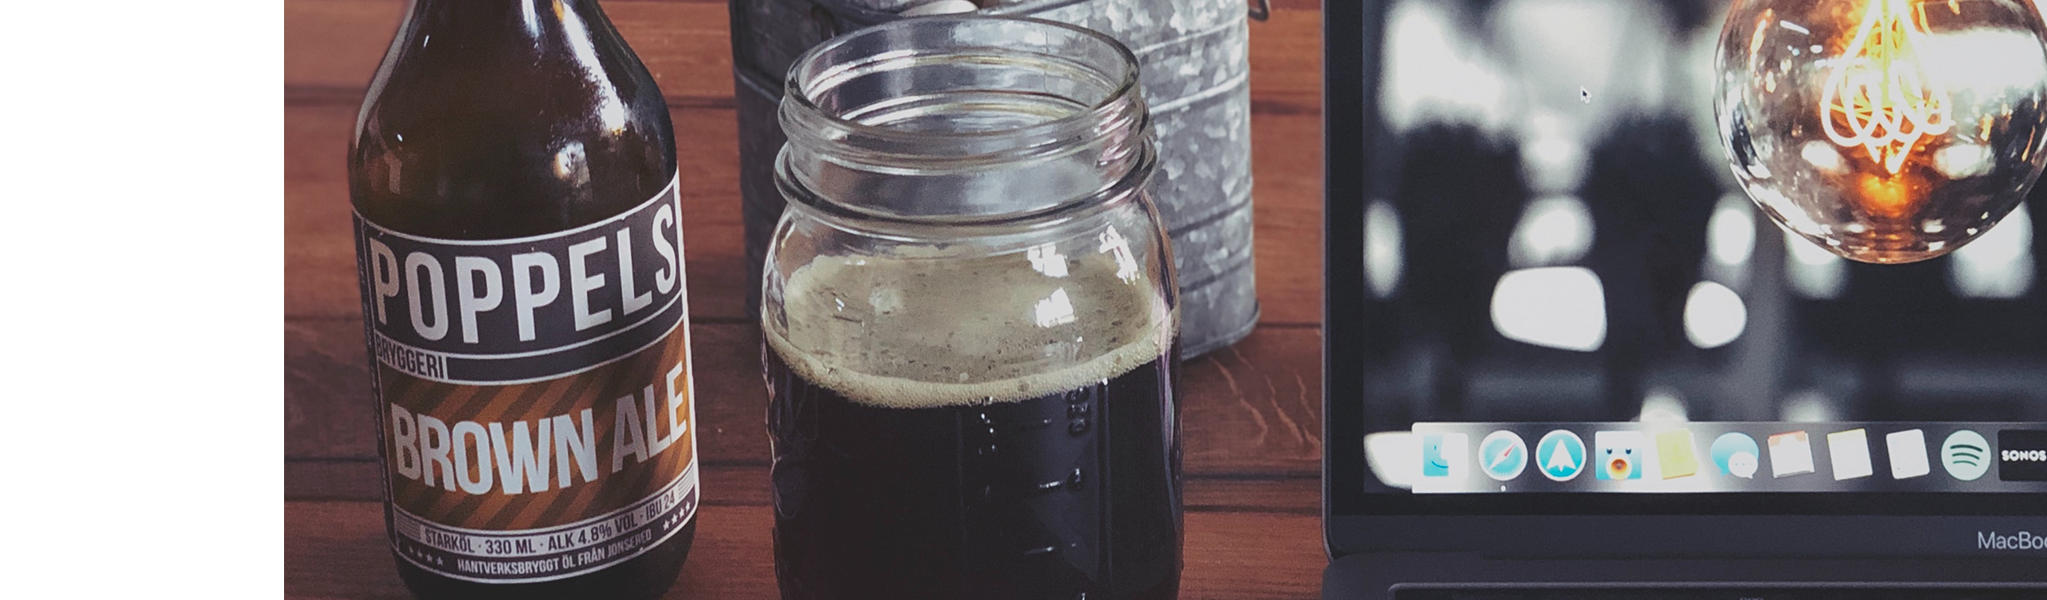 Brown Ale fra svenske Poppels Bryggeri